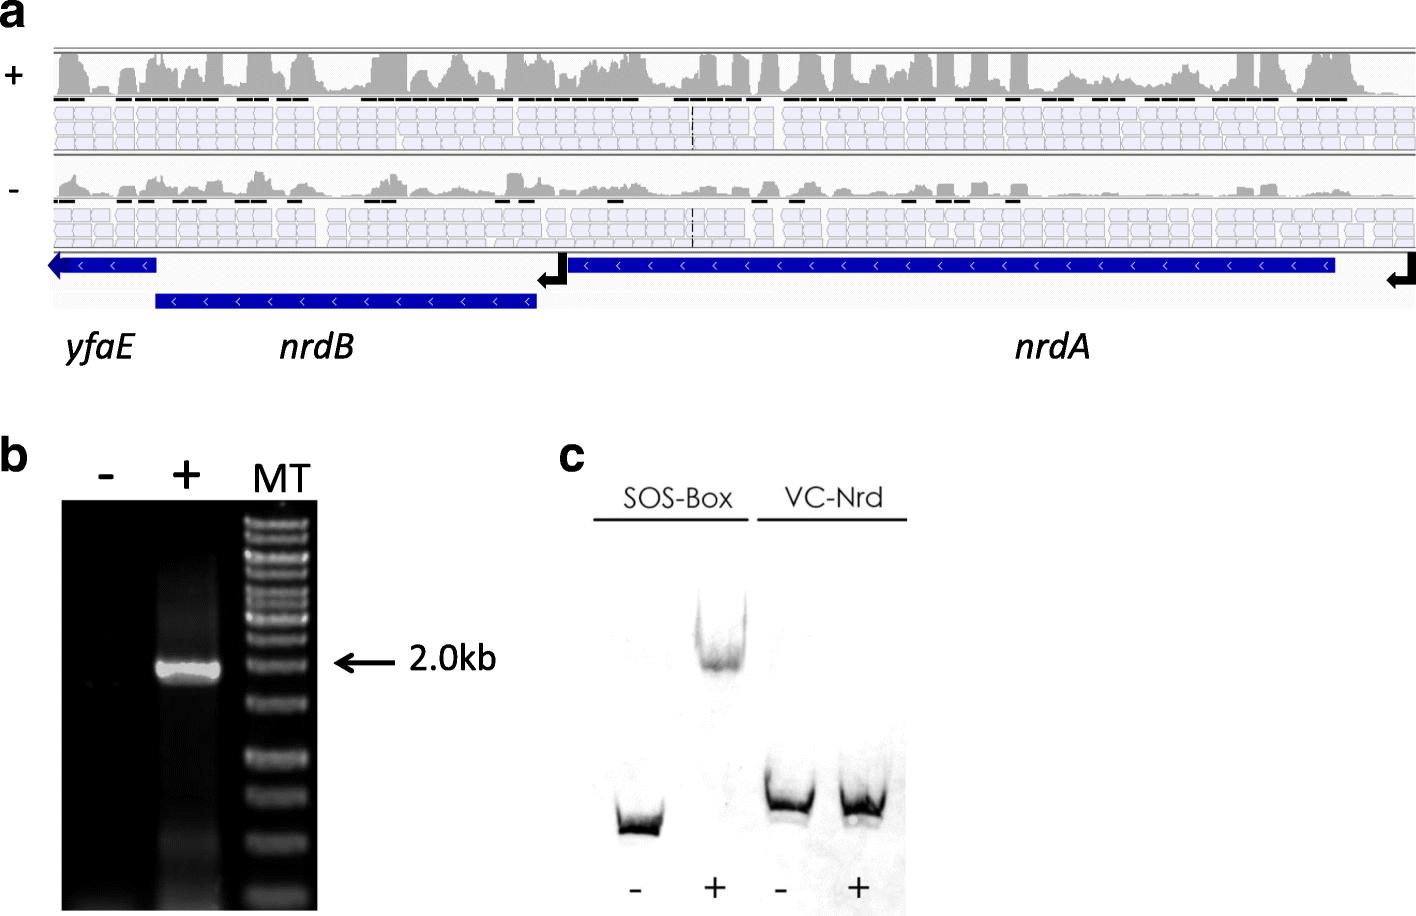 Expansion of the SOS regulon of Vibrio cholerae through extensive